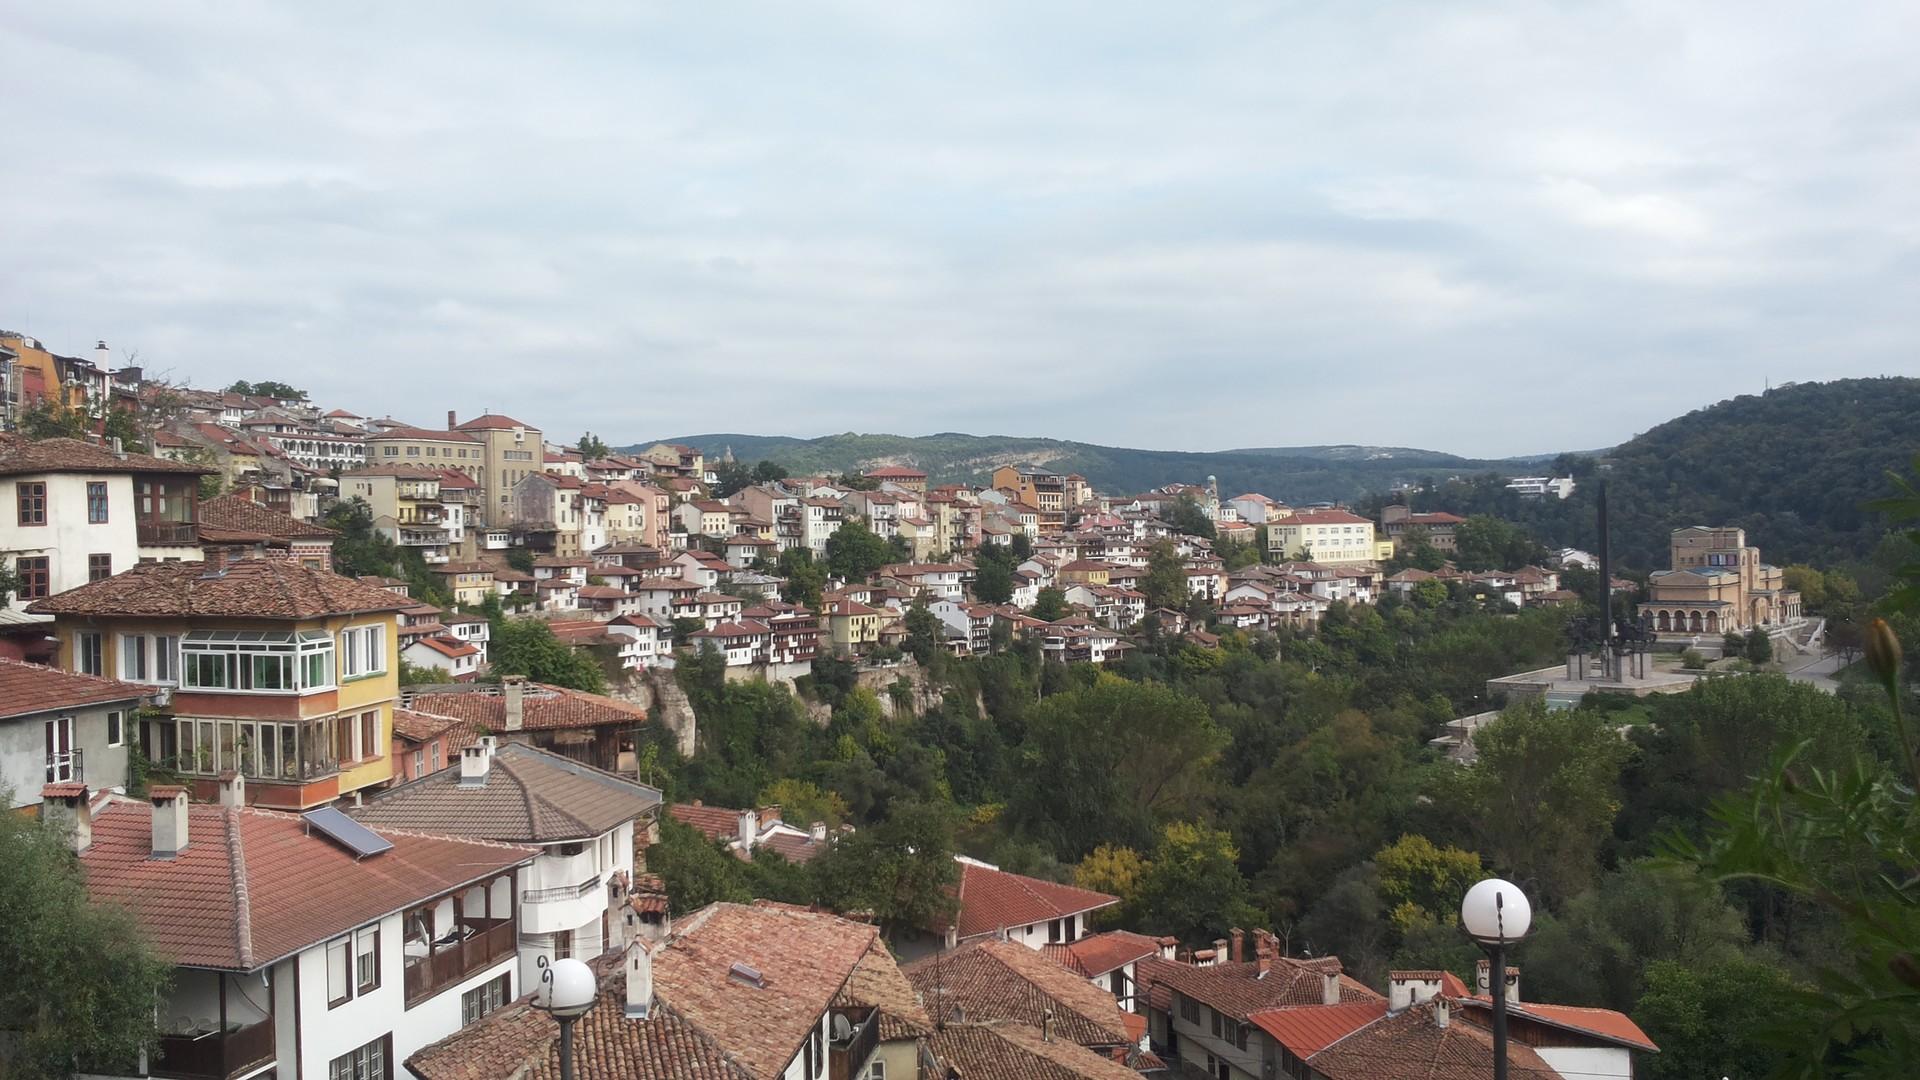 Expérience à Veliko Tarnovo, Bulgarie par Bojidara